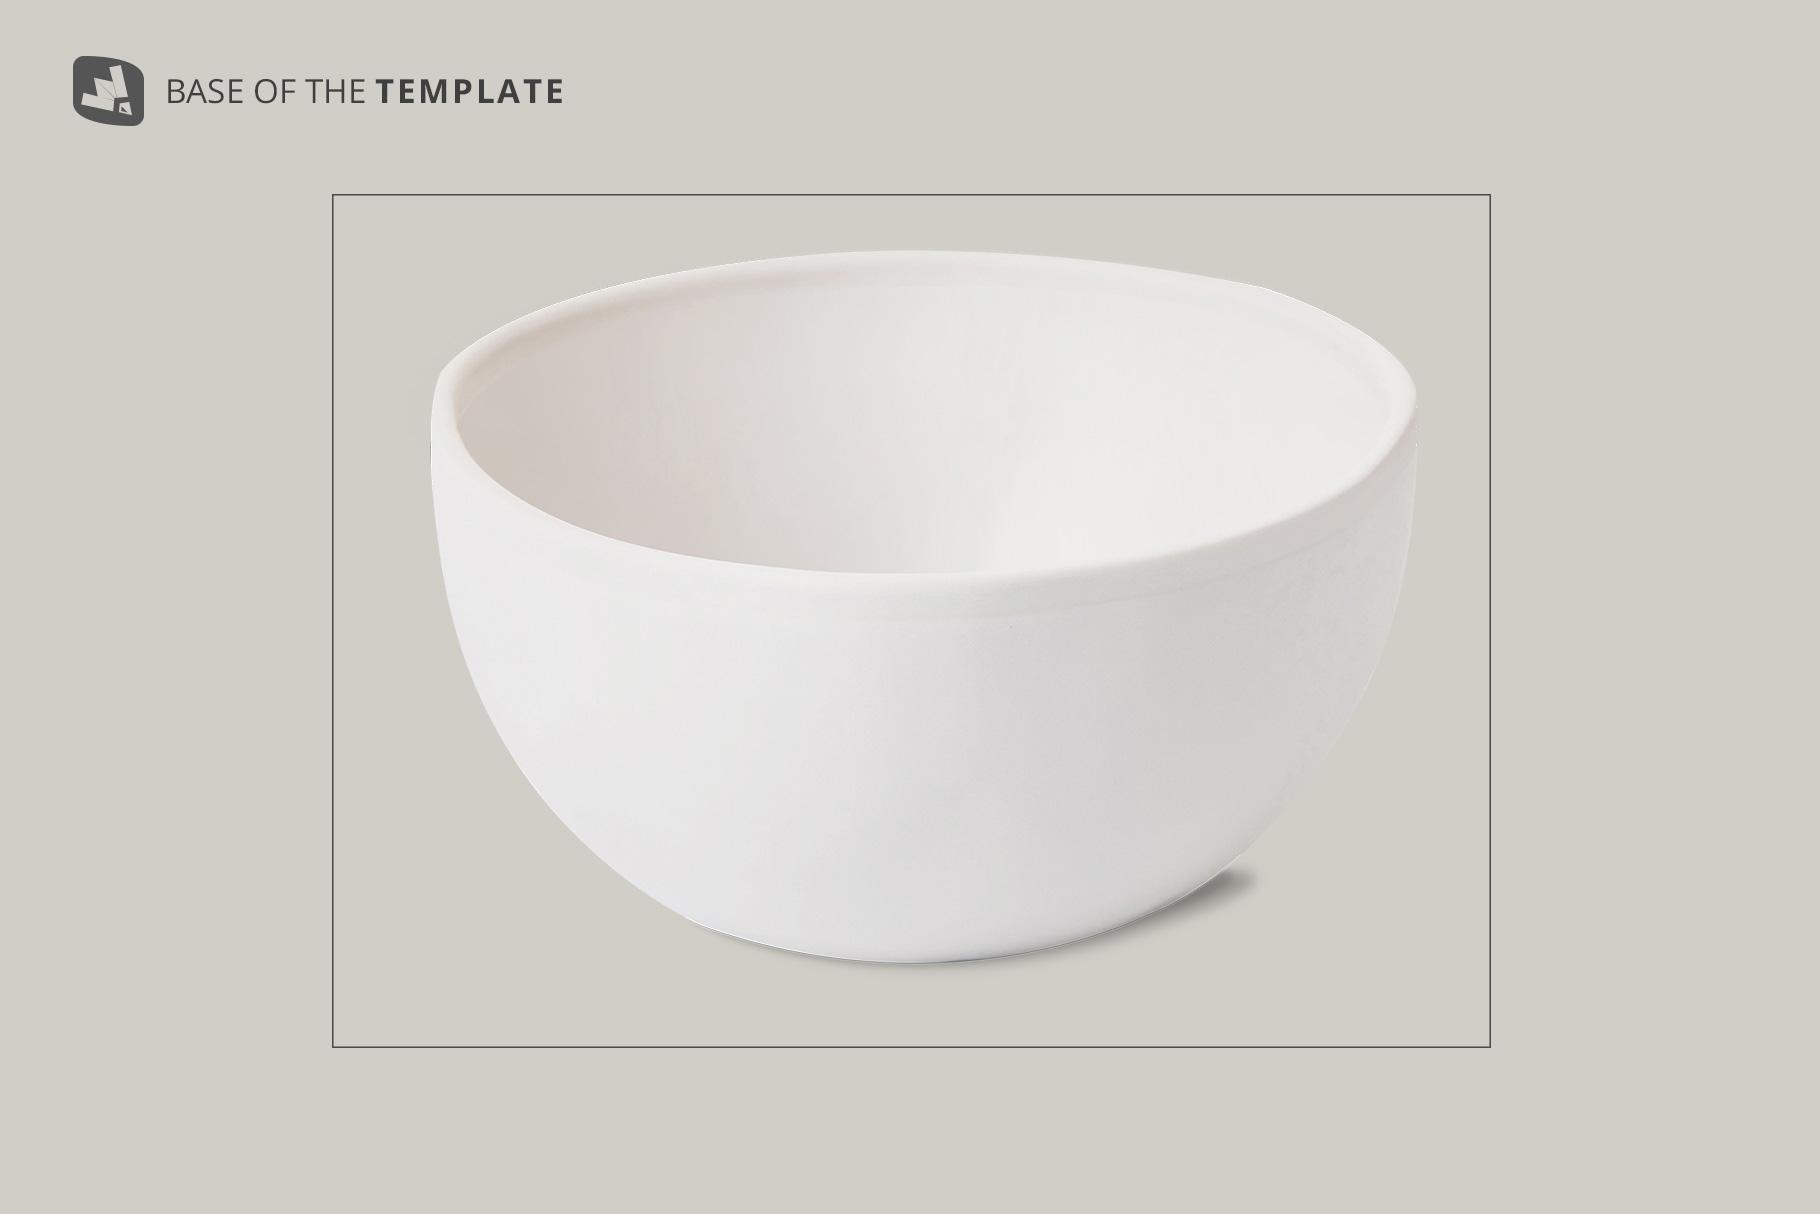 base image of the front view bowl mockup vol.2